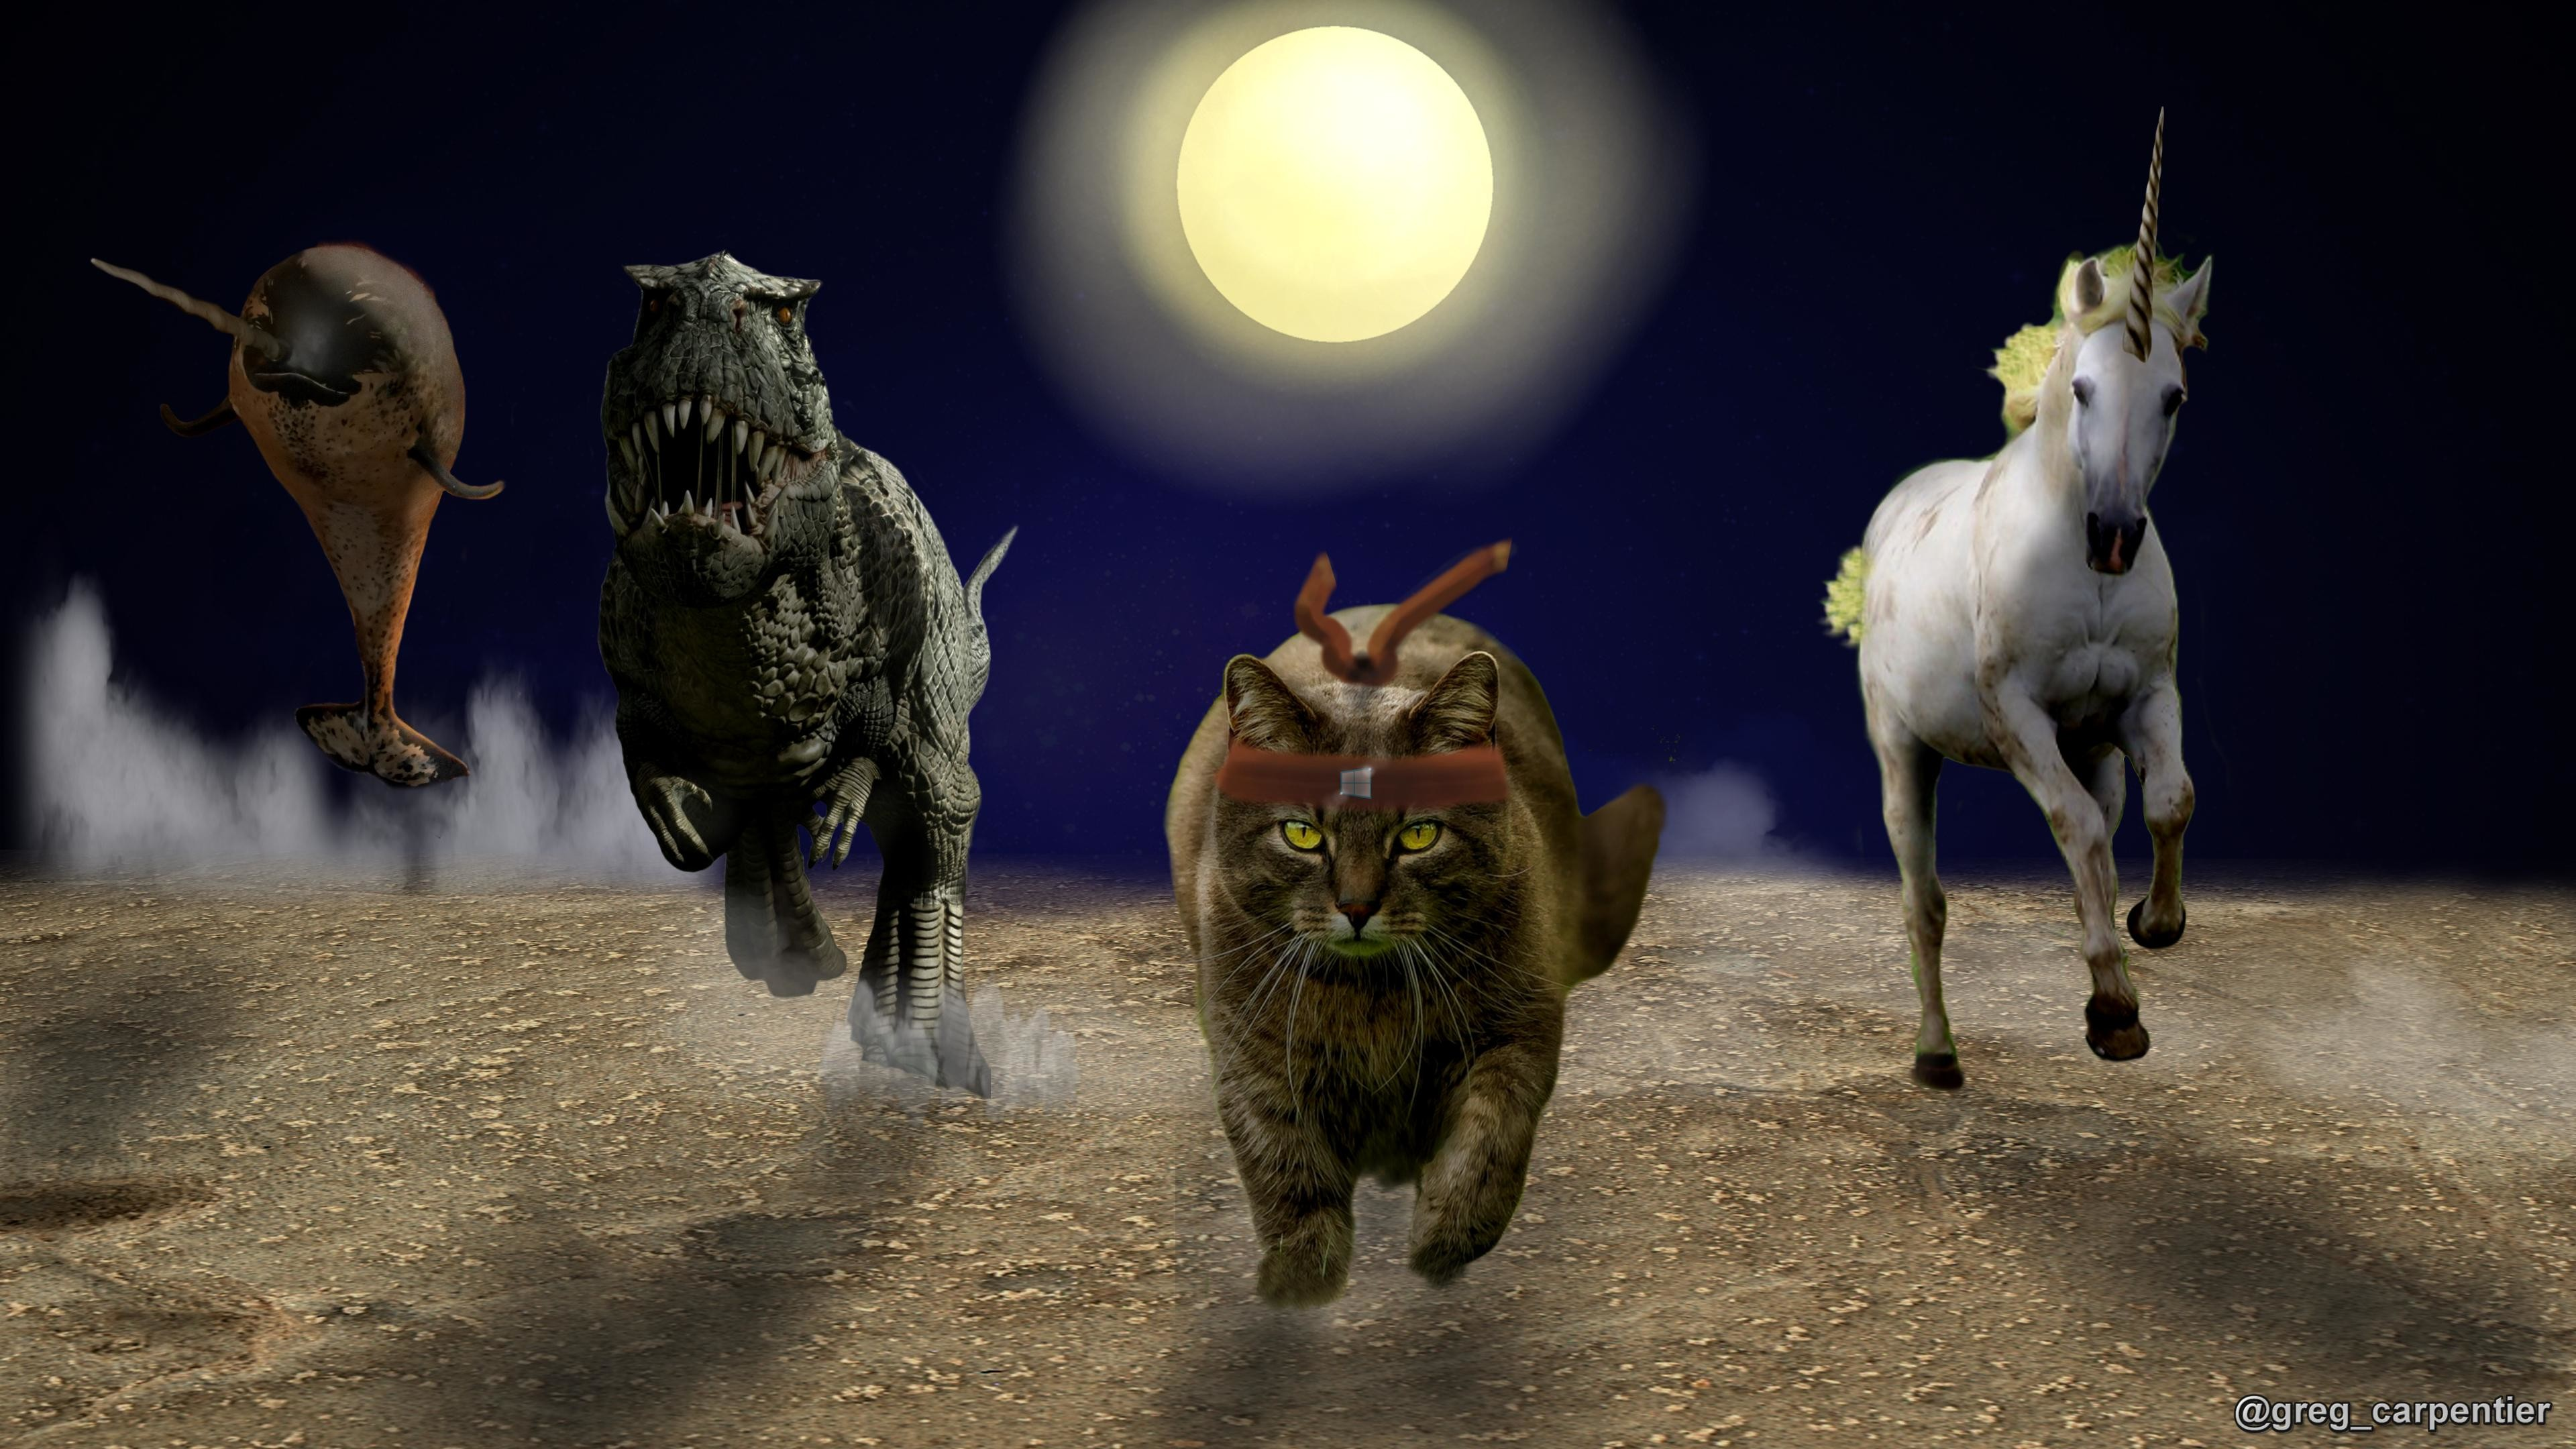 Res: 3840x2160, ... Ninja Cat Wallpaper By Greg Carpentier ...